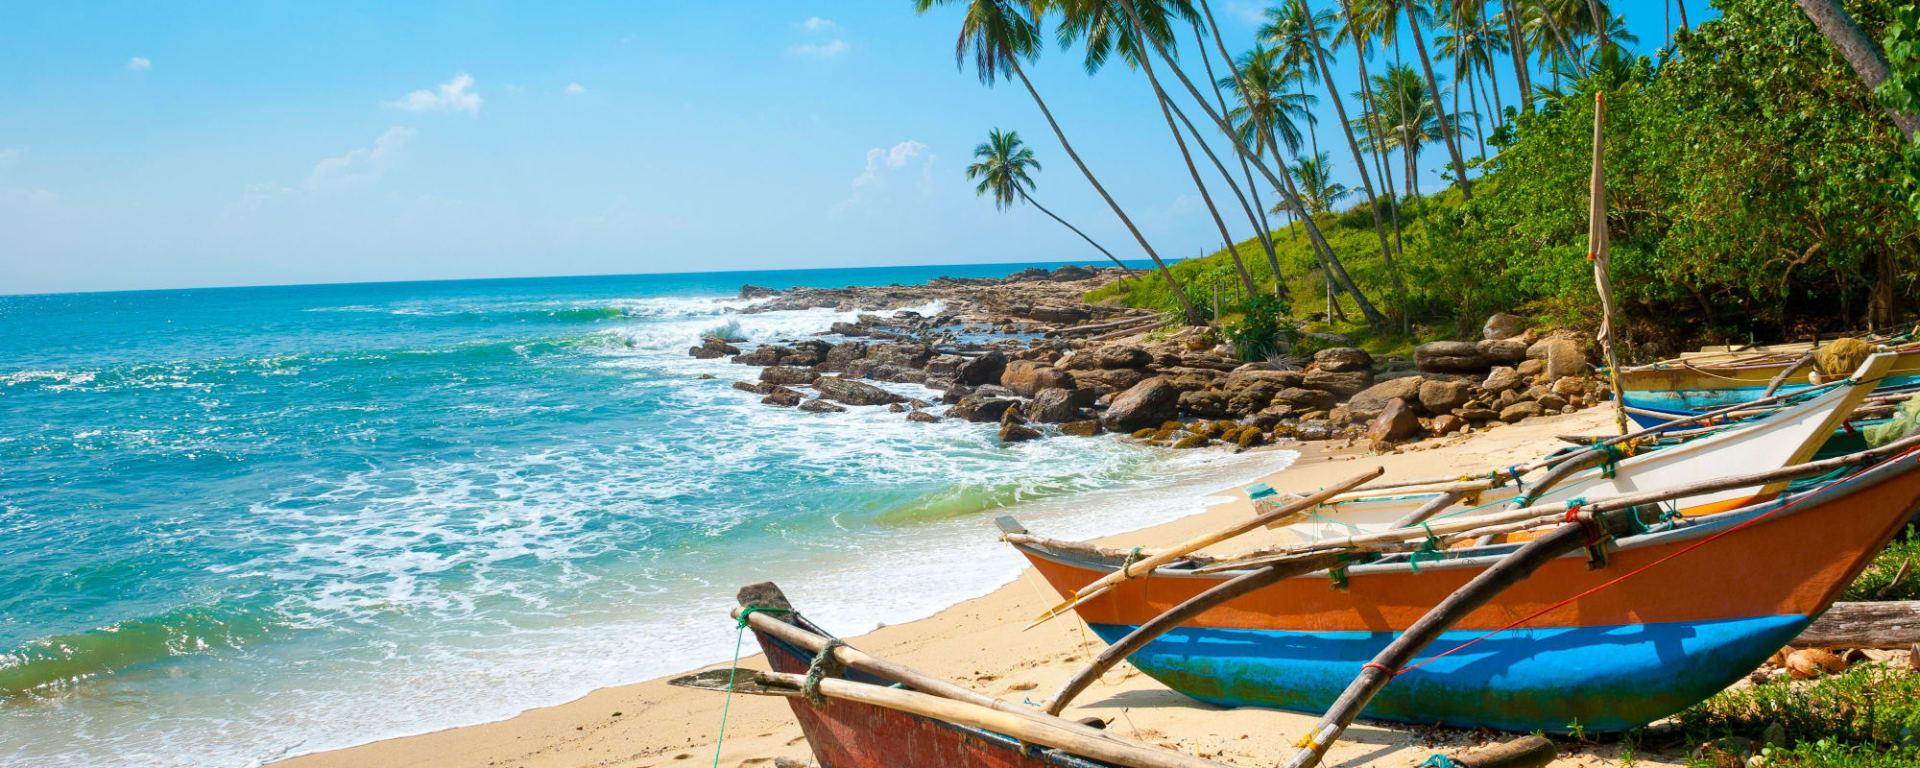 Familienabenteuer Sri Lanka ab Colombo: Sri Lanka Strand